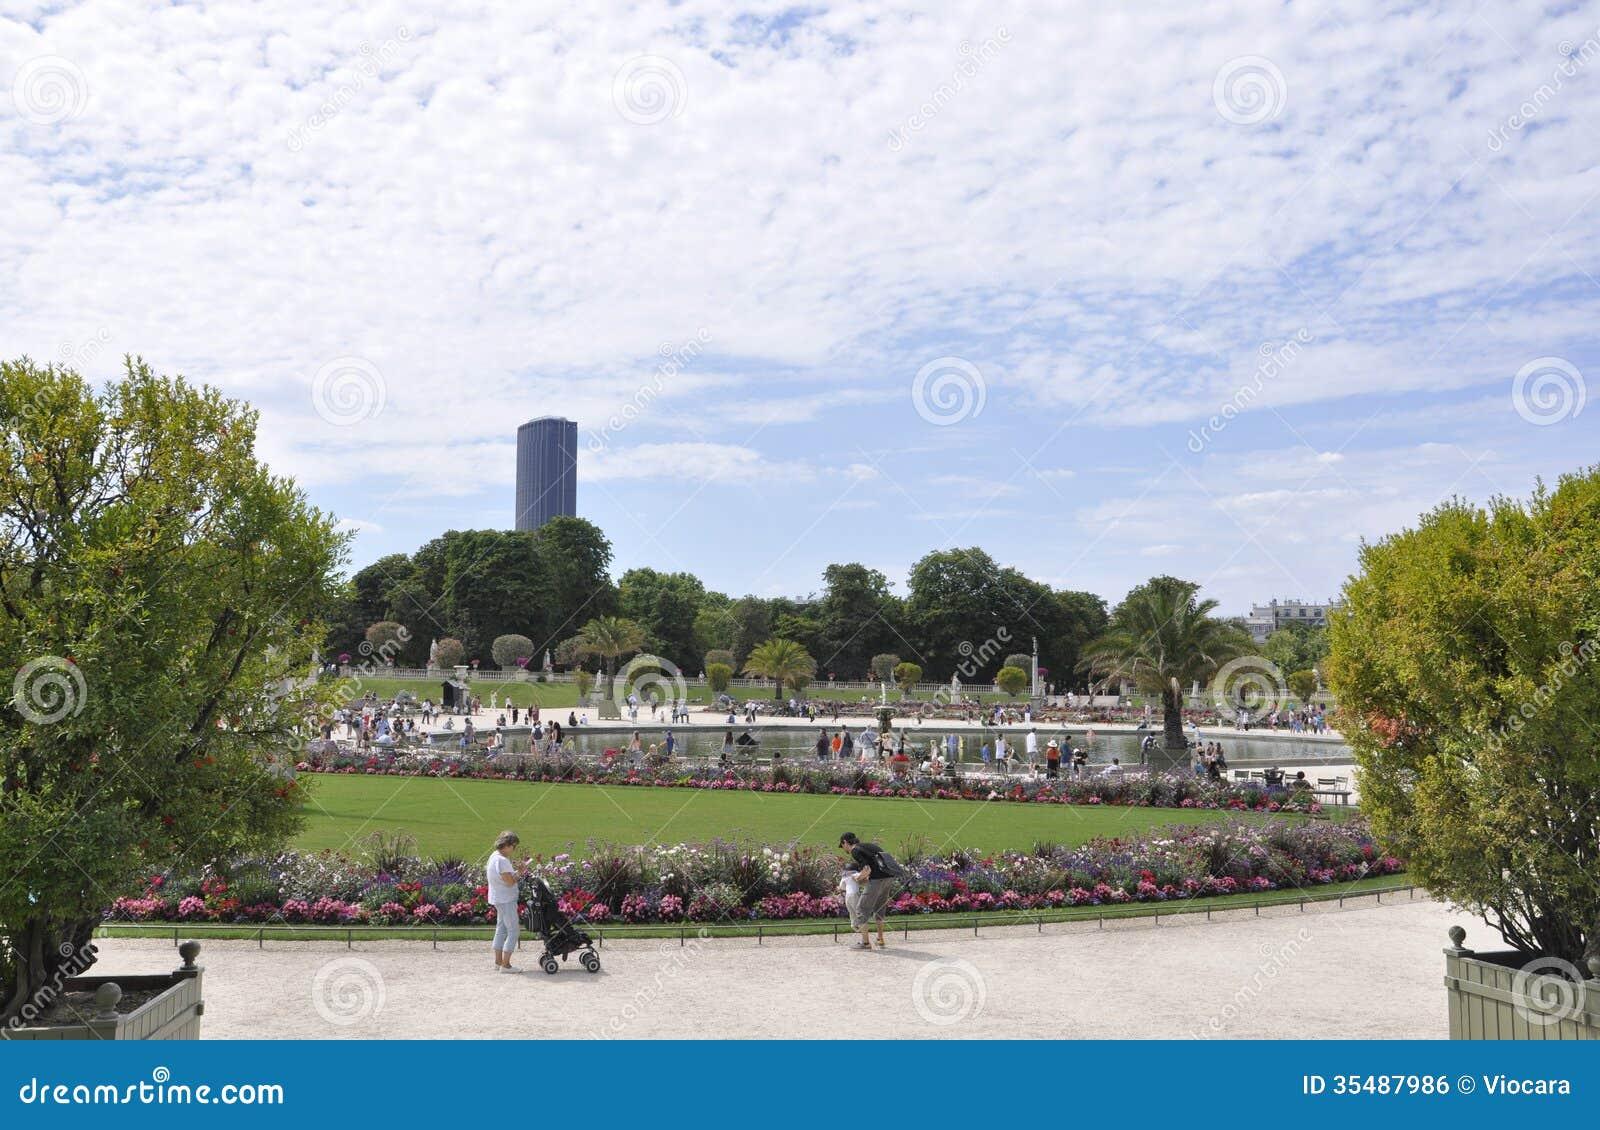 Paris August 15,2013-Luxembourg Garden in Paris